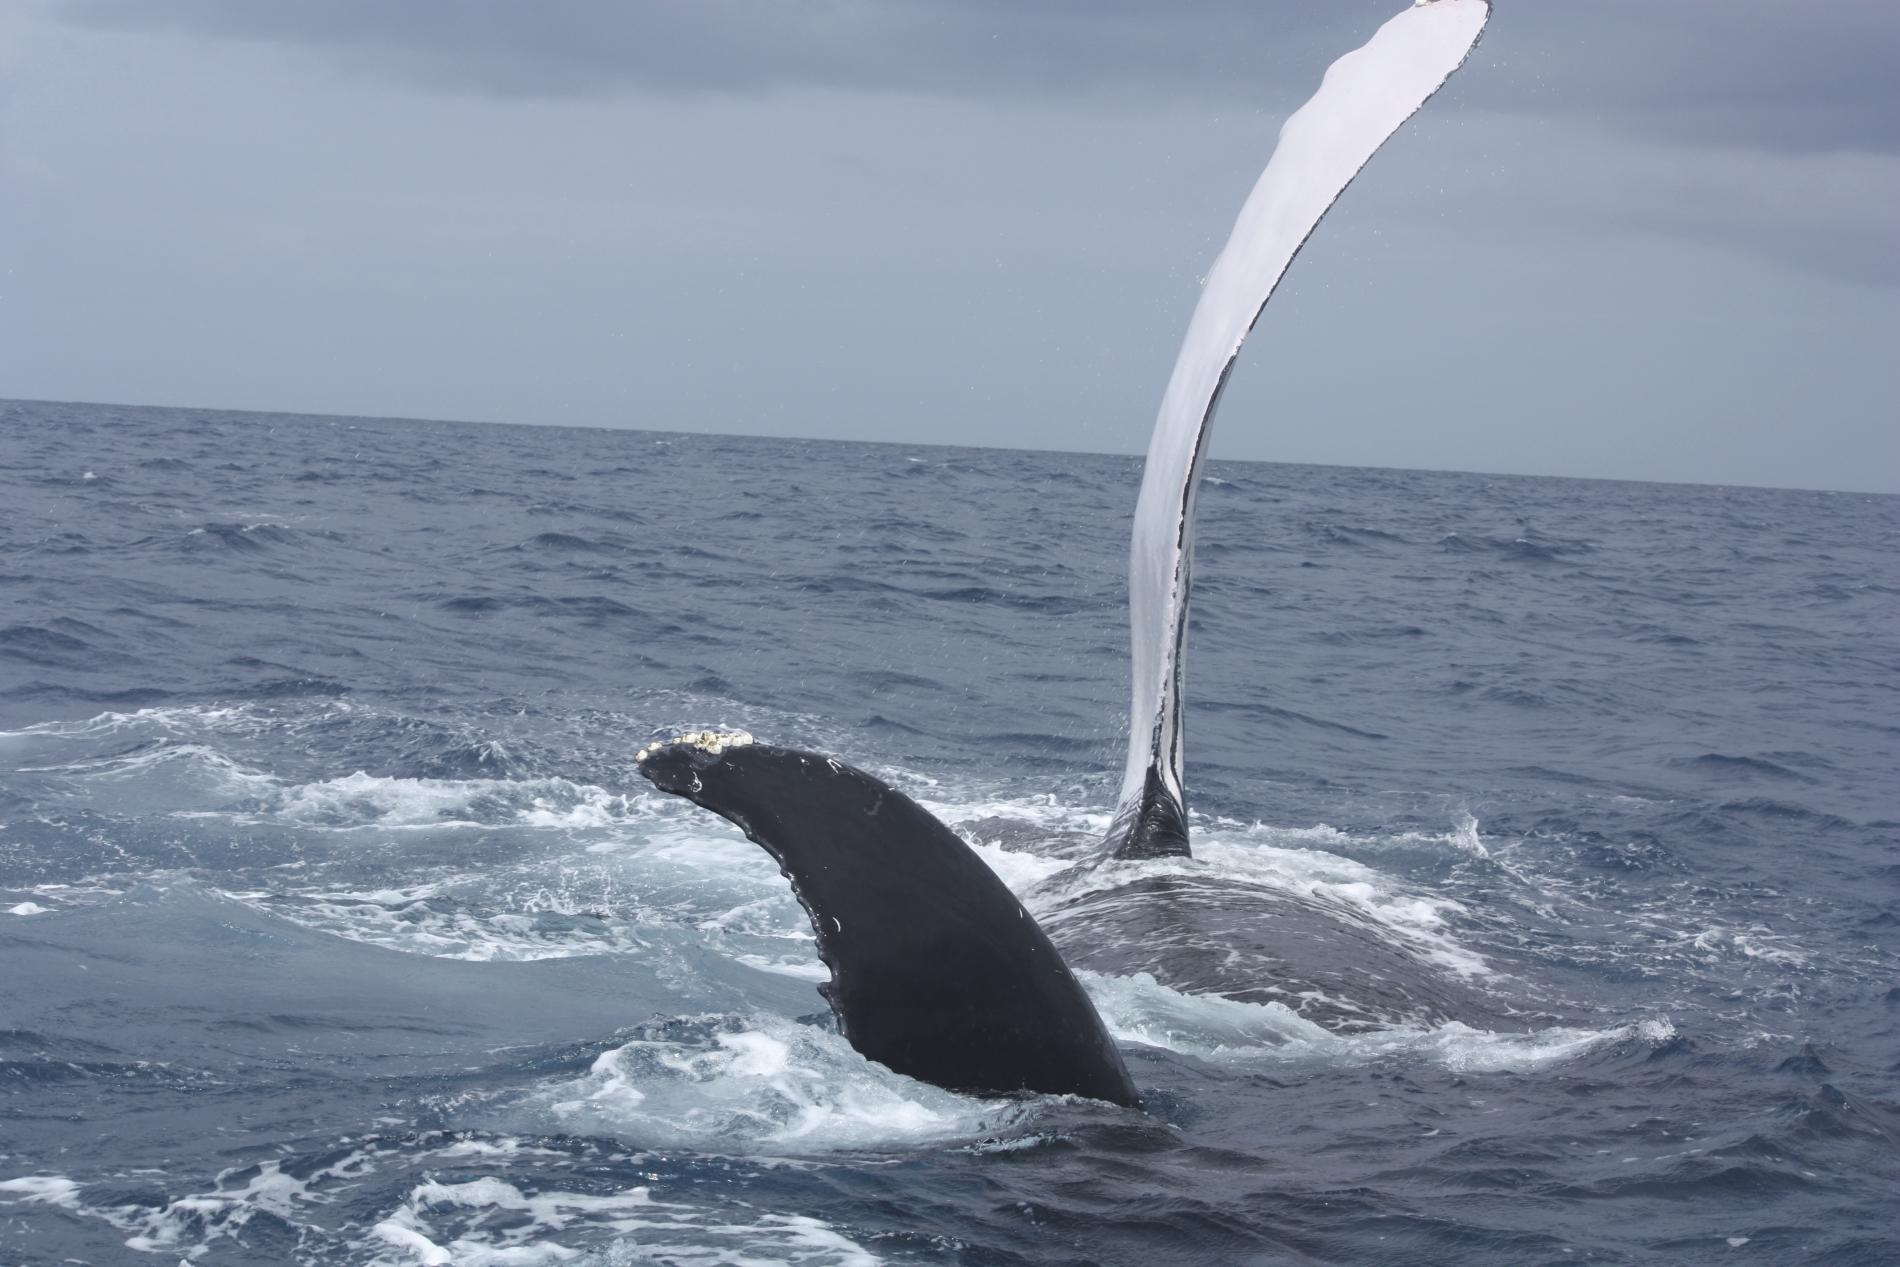 Baleine qui plonge